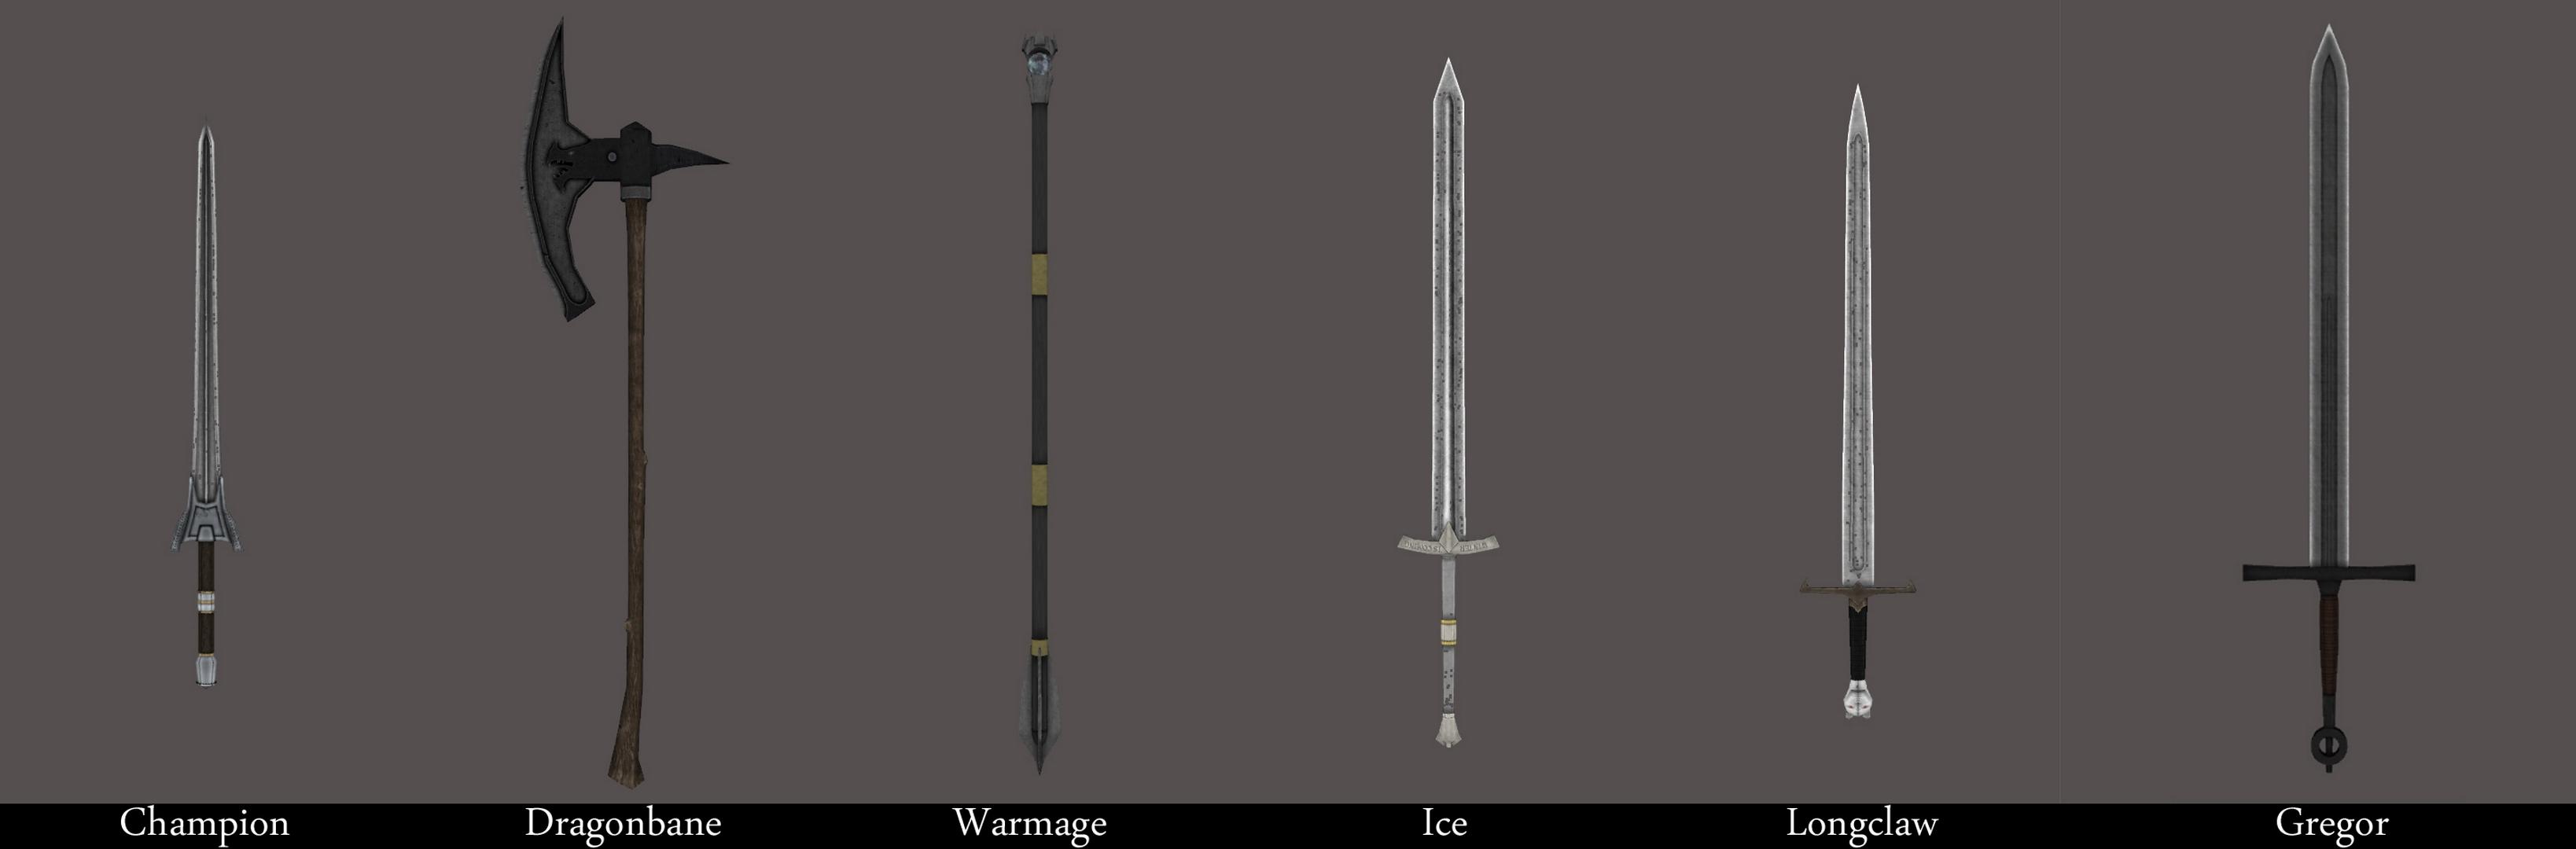 Armor_Compilation_02.jpg